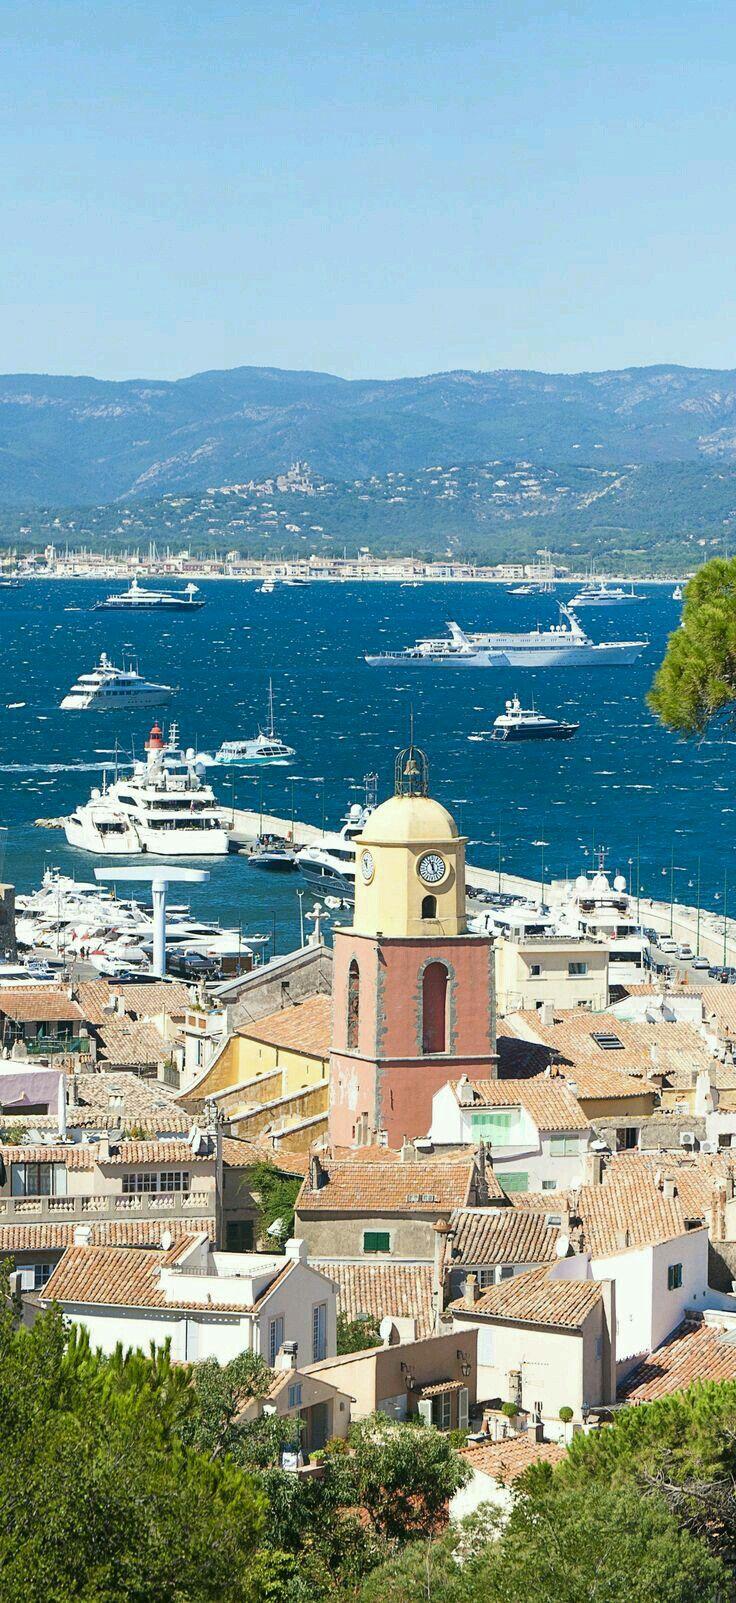 San Tropez, French Riviera.